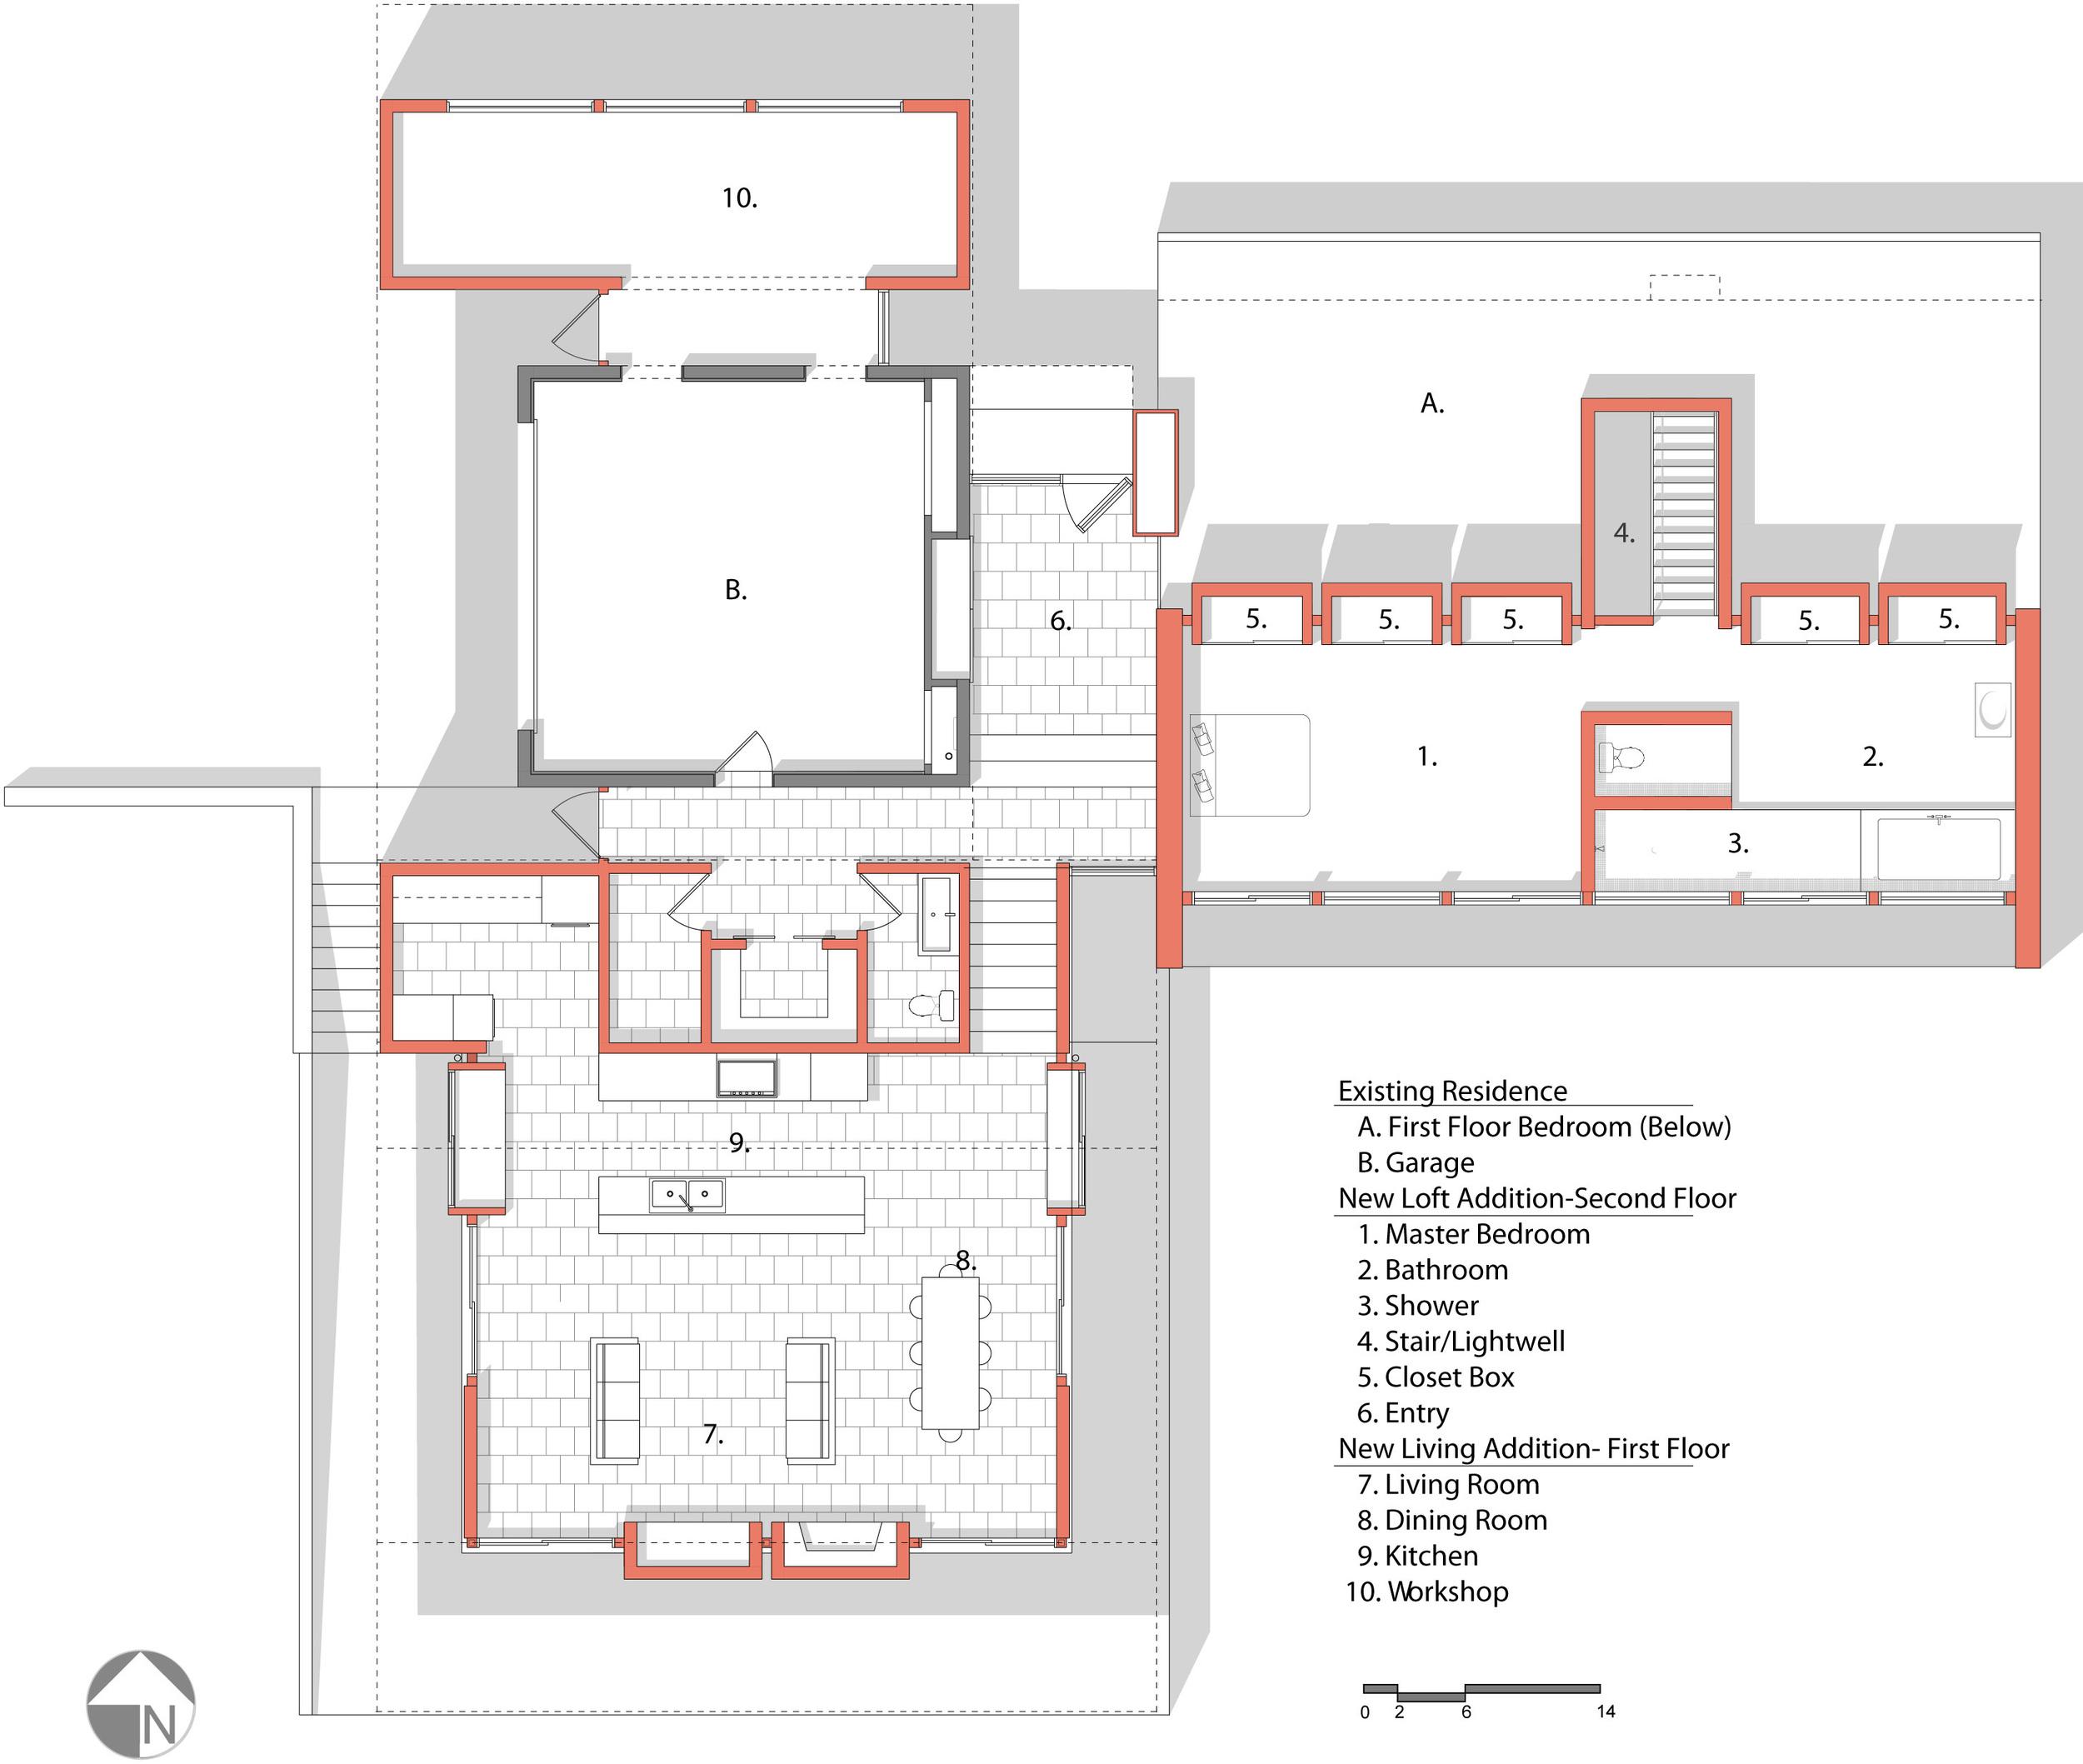 floorplan_rev.jpg